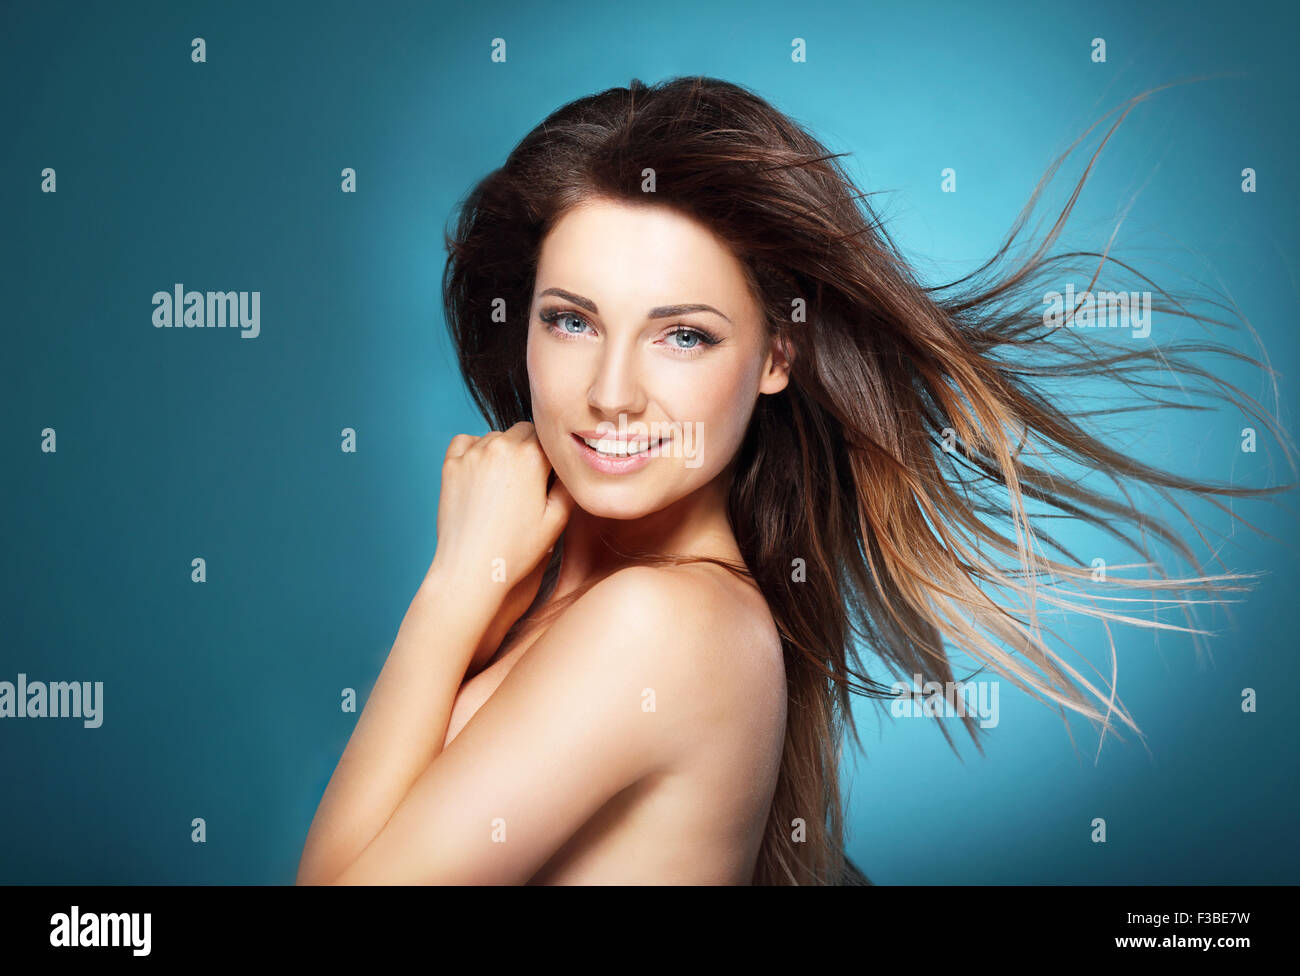 Femme sur fond bleu Photo Stock